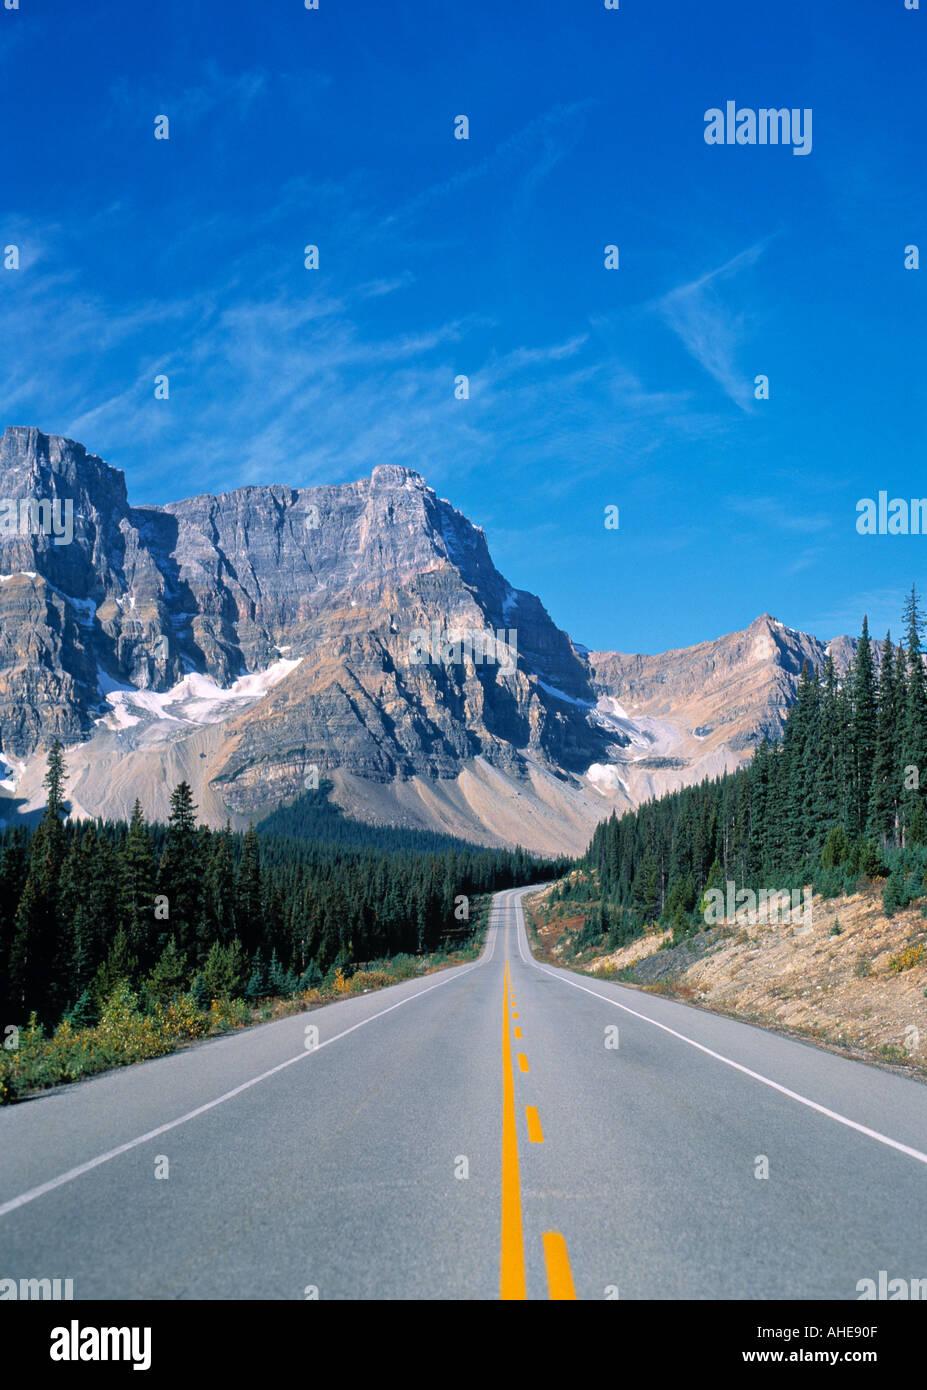 Road and mountains, Colorado, Rockies, USA - Stock Image